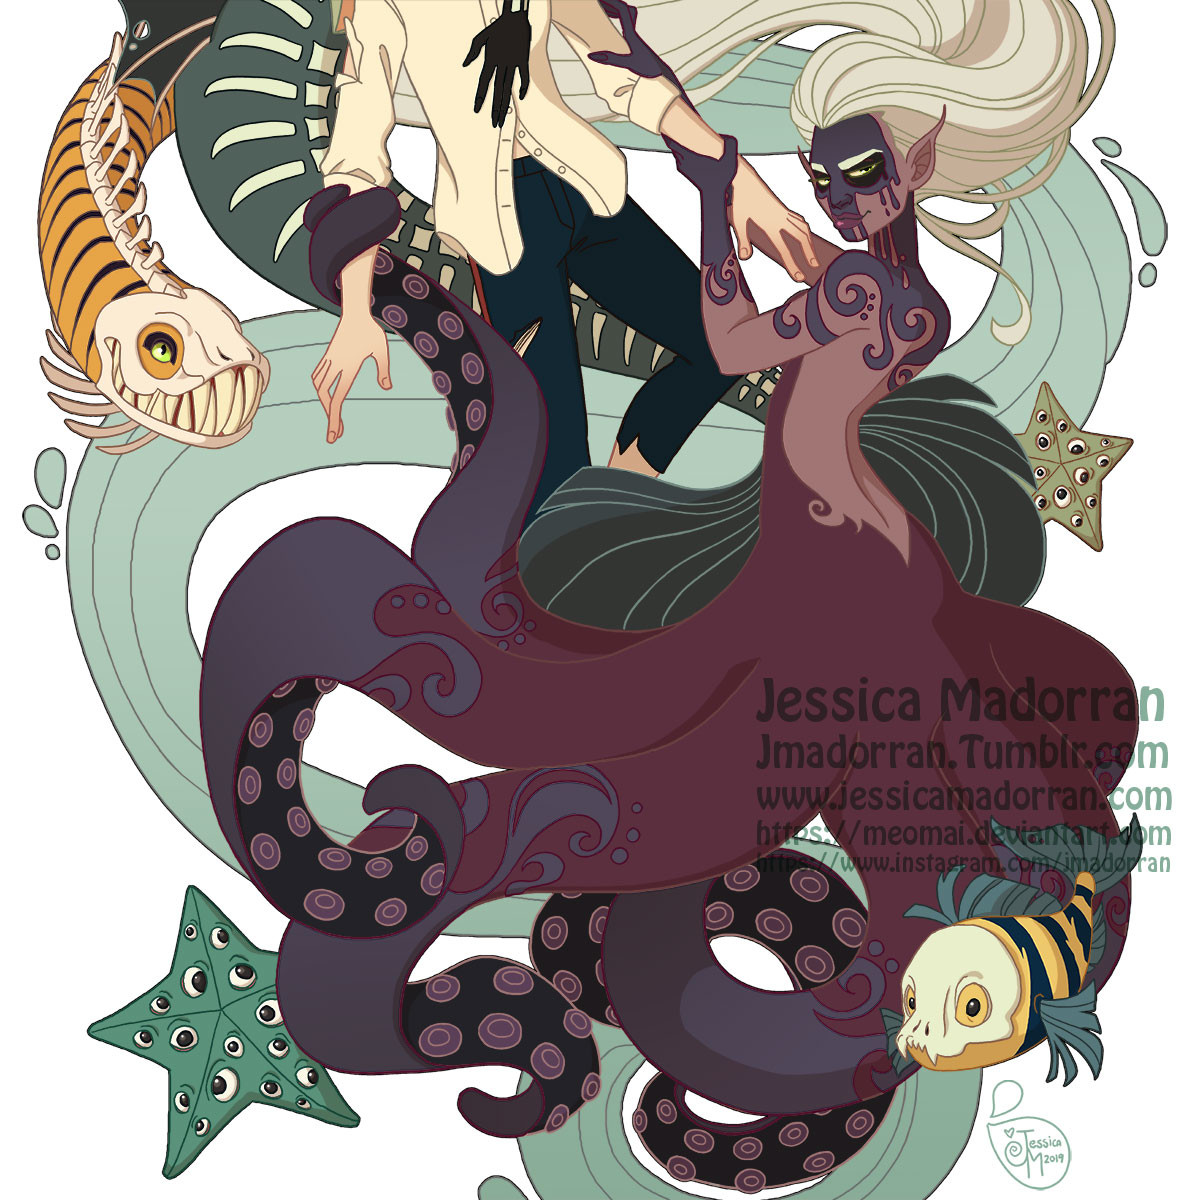 Jessica madorran character design little mermaid dayofthedex illustration 2019 artstation artstation02